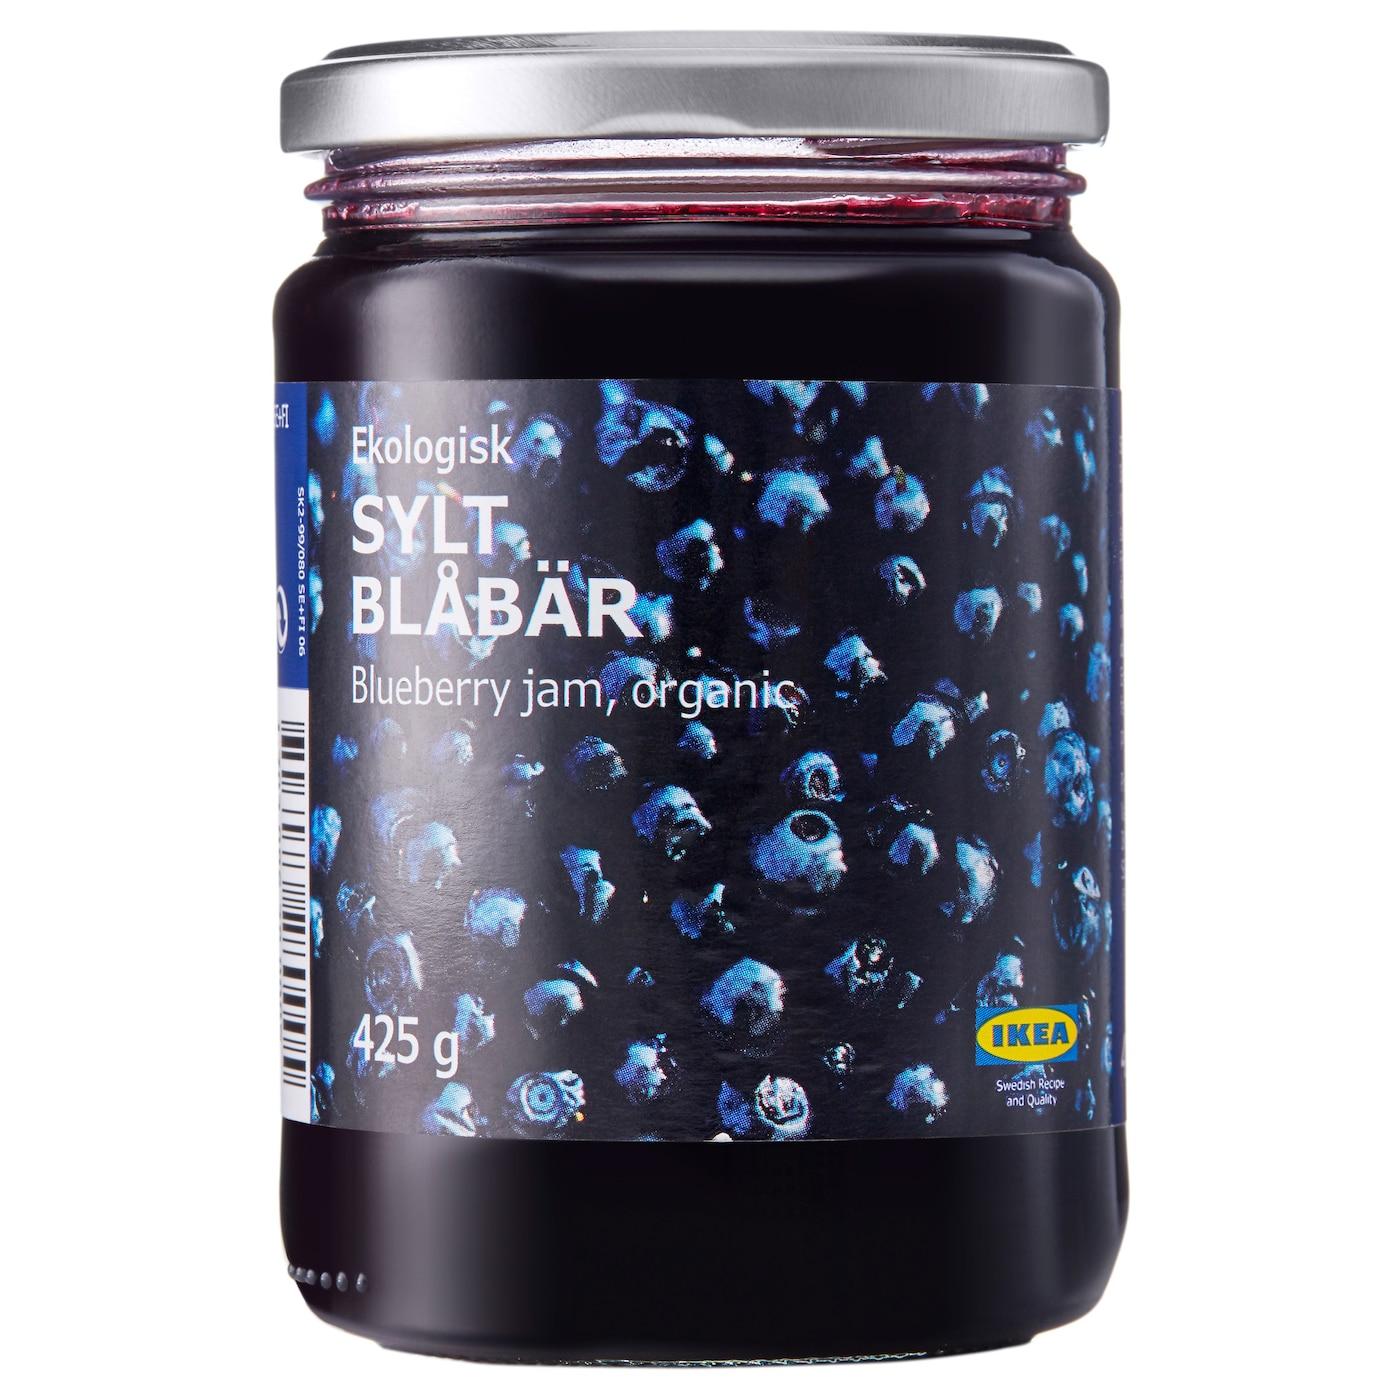 SYLT BLÅBÄR, Blueberry jam - IKEA